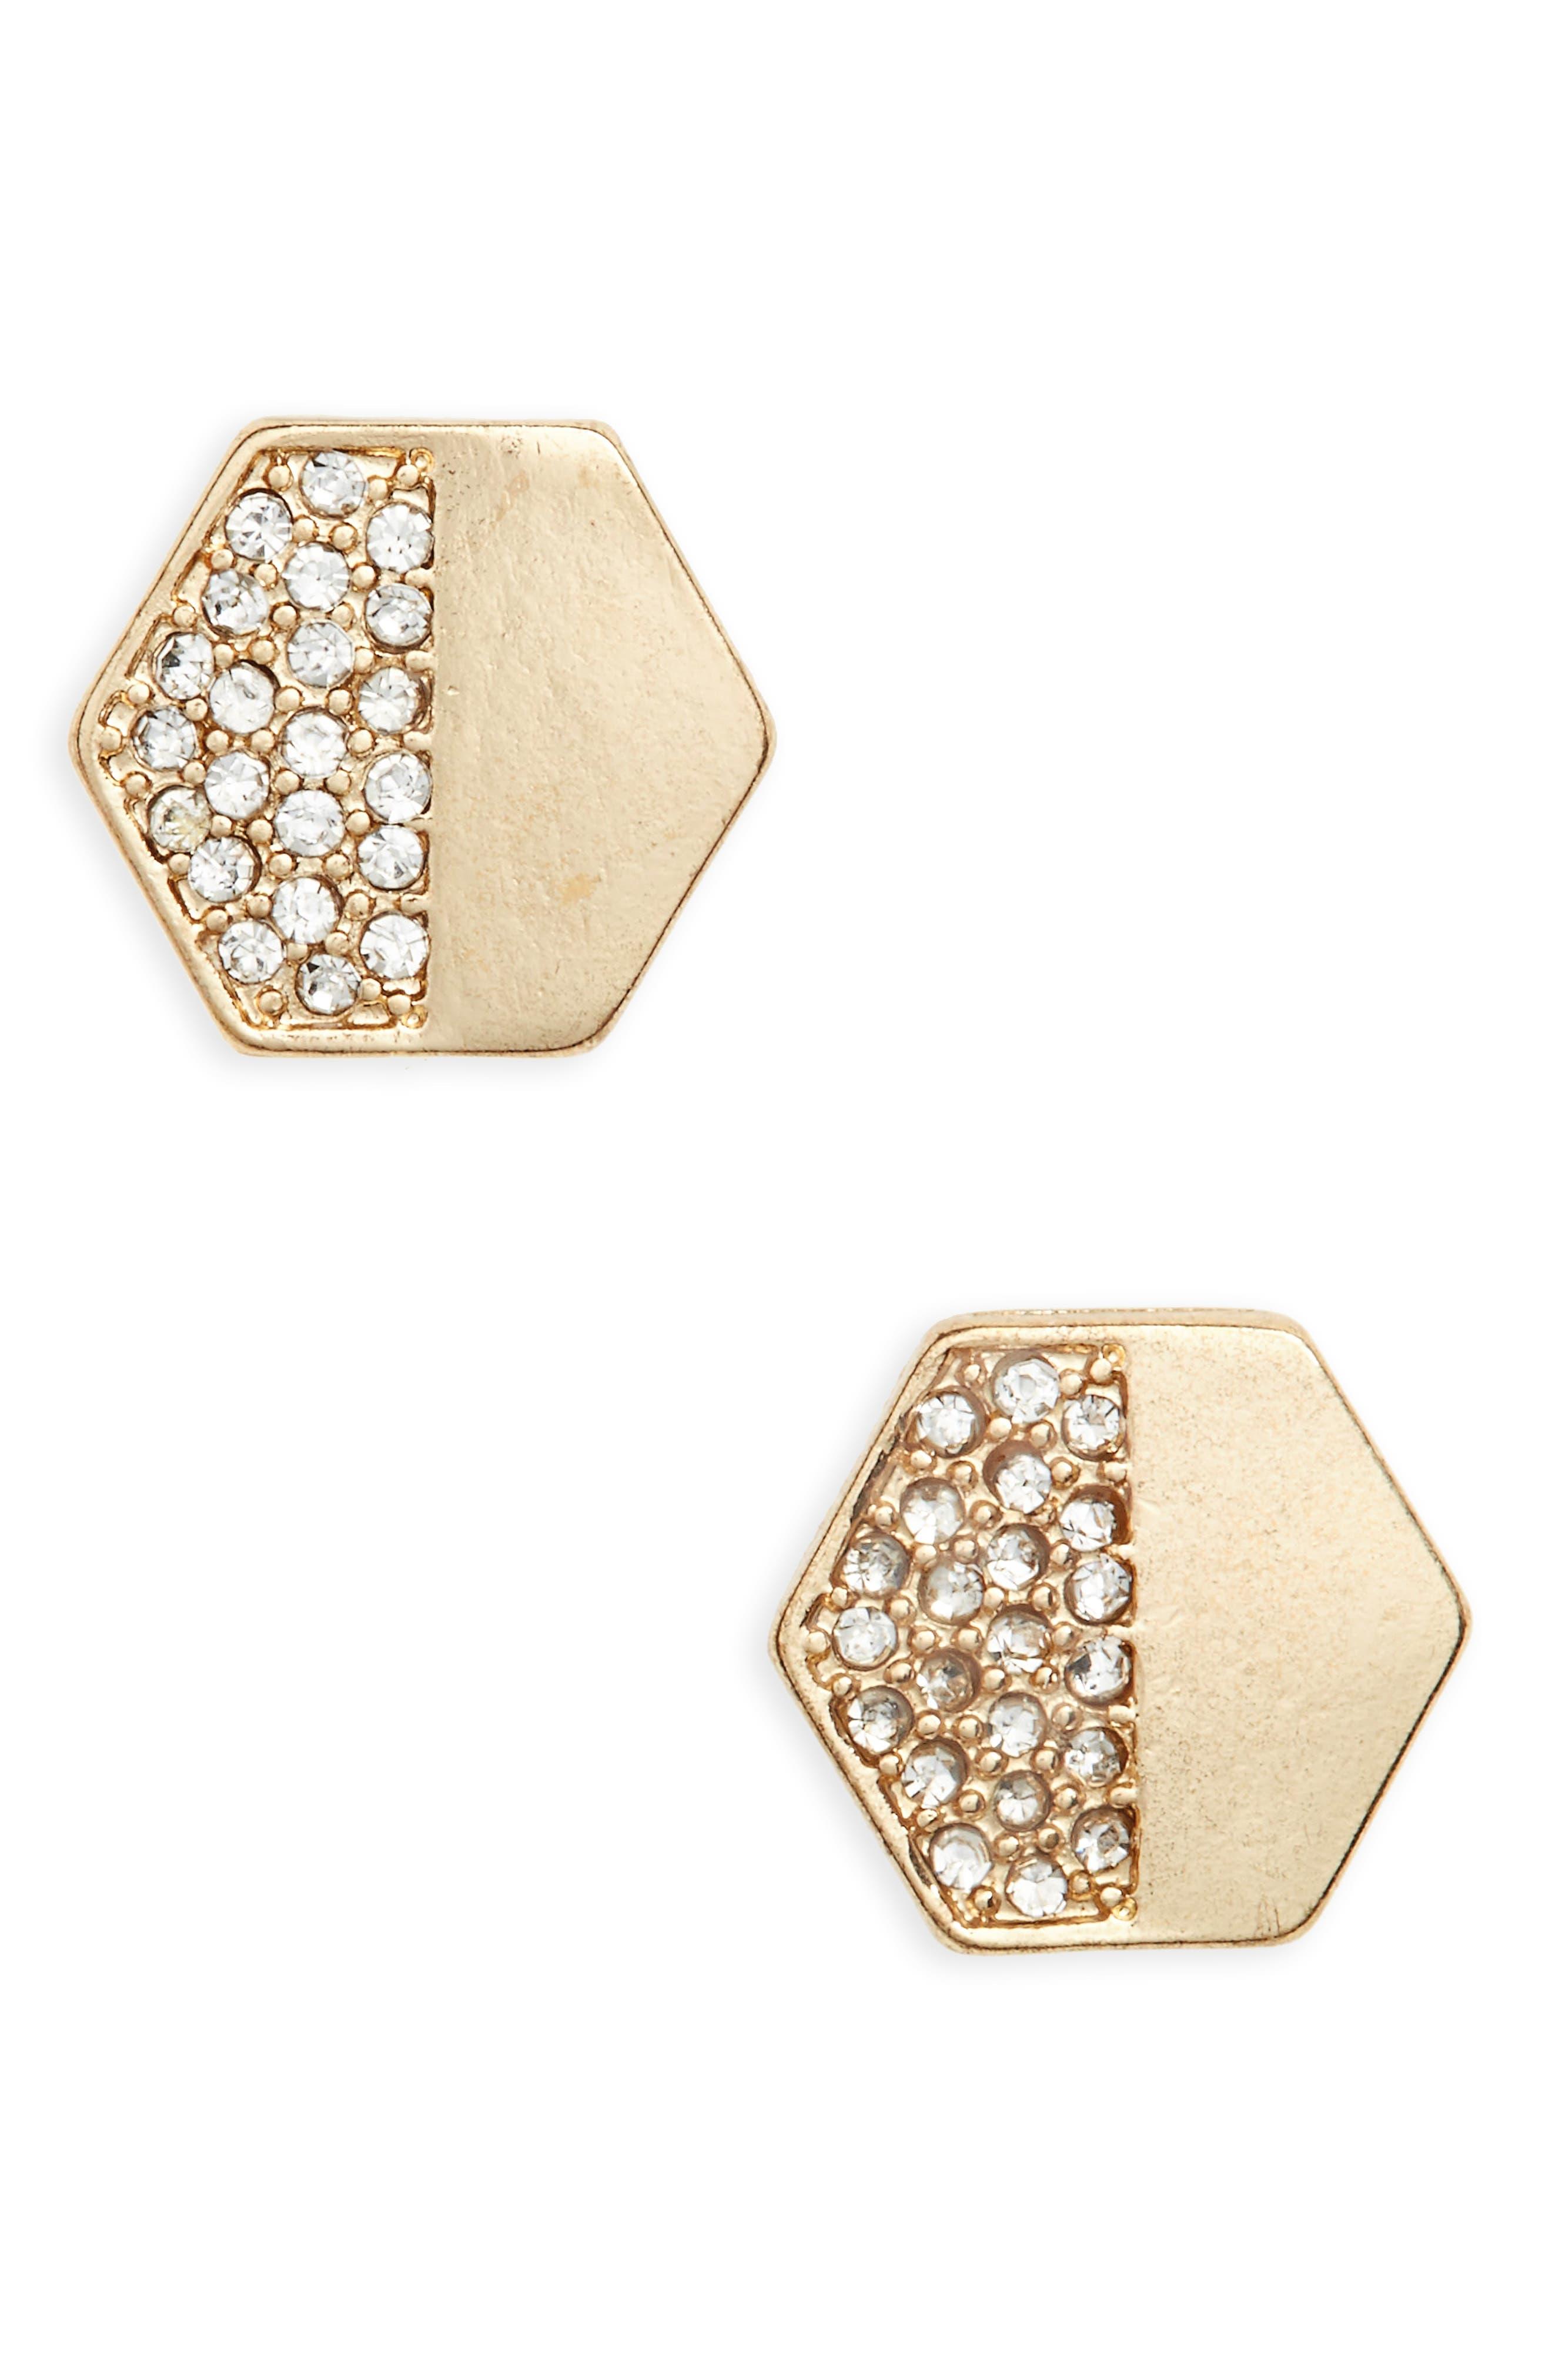 Crystal Hexagon Stud Earrings,                         Main,                         color, Gold/ Crystal